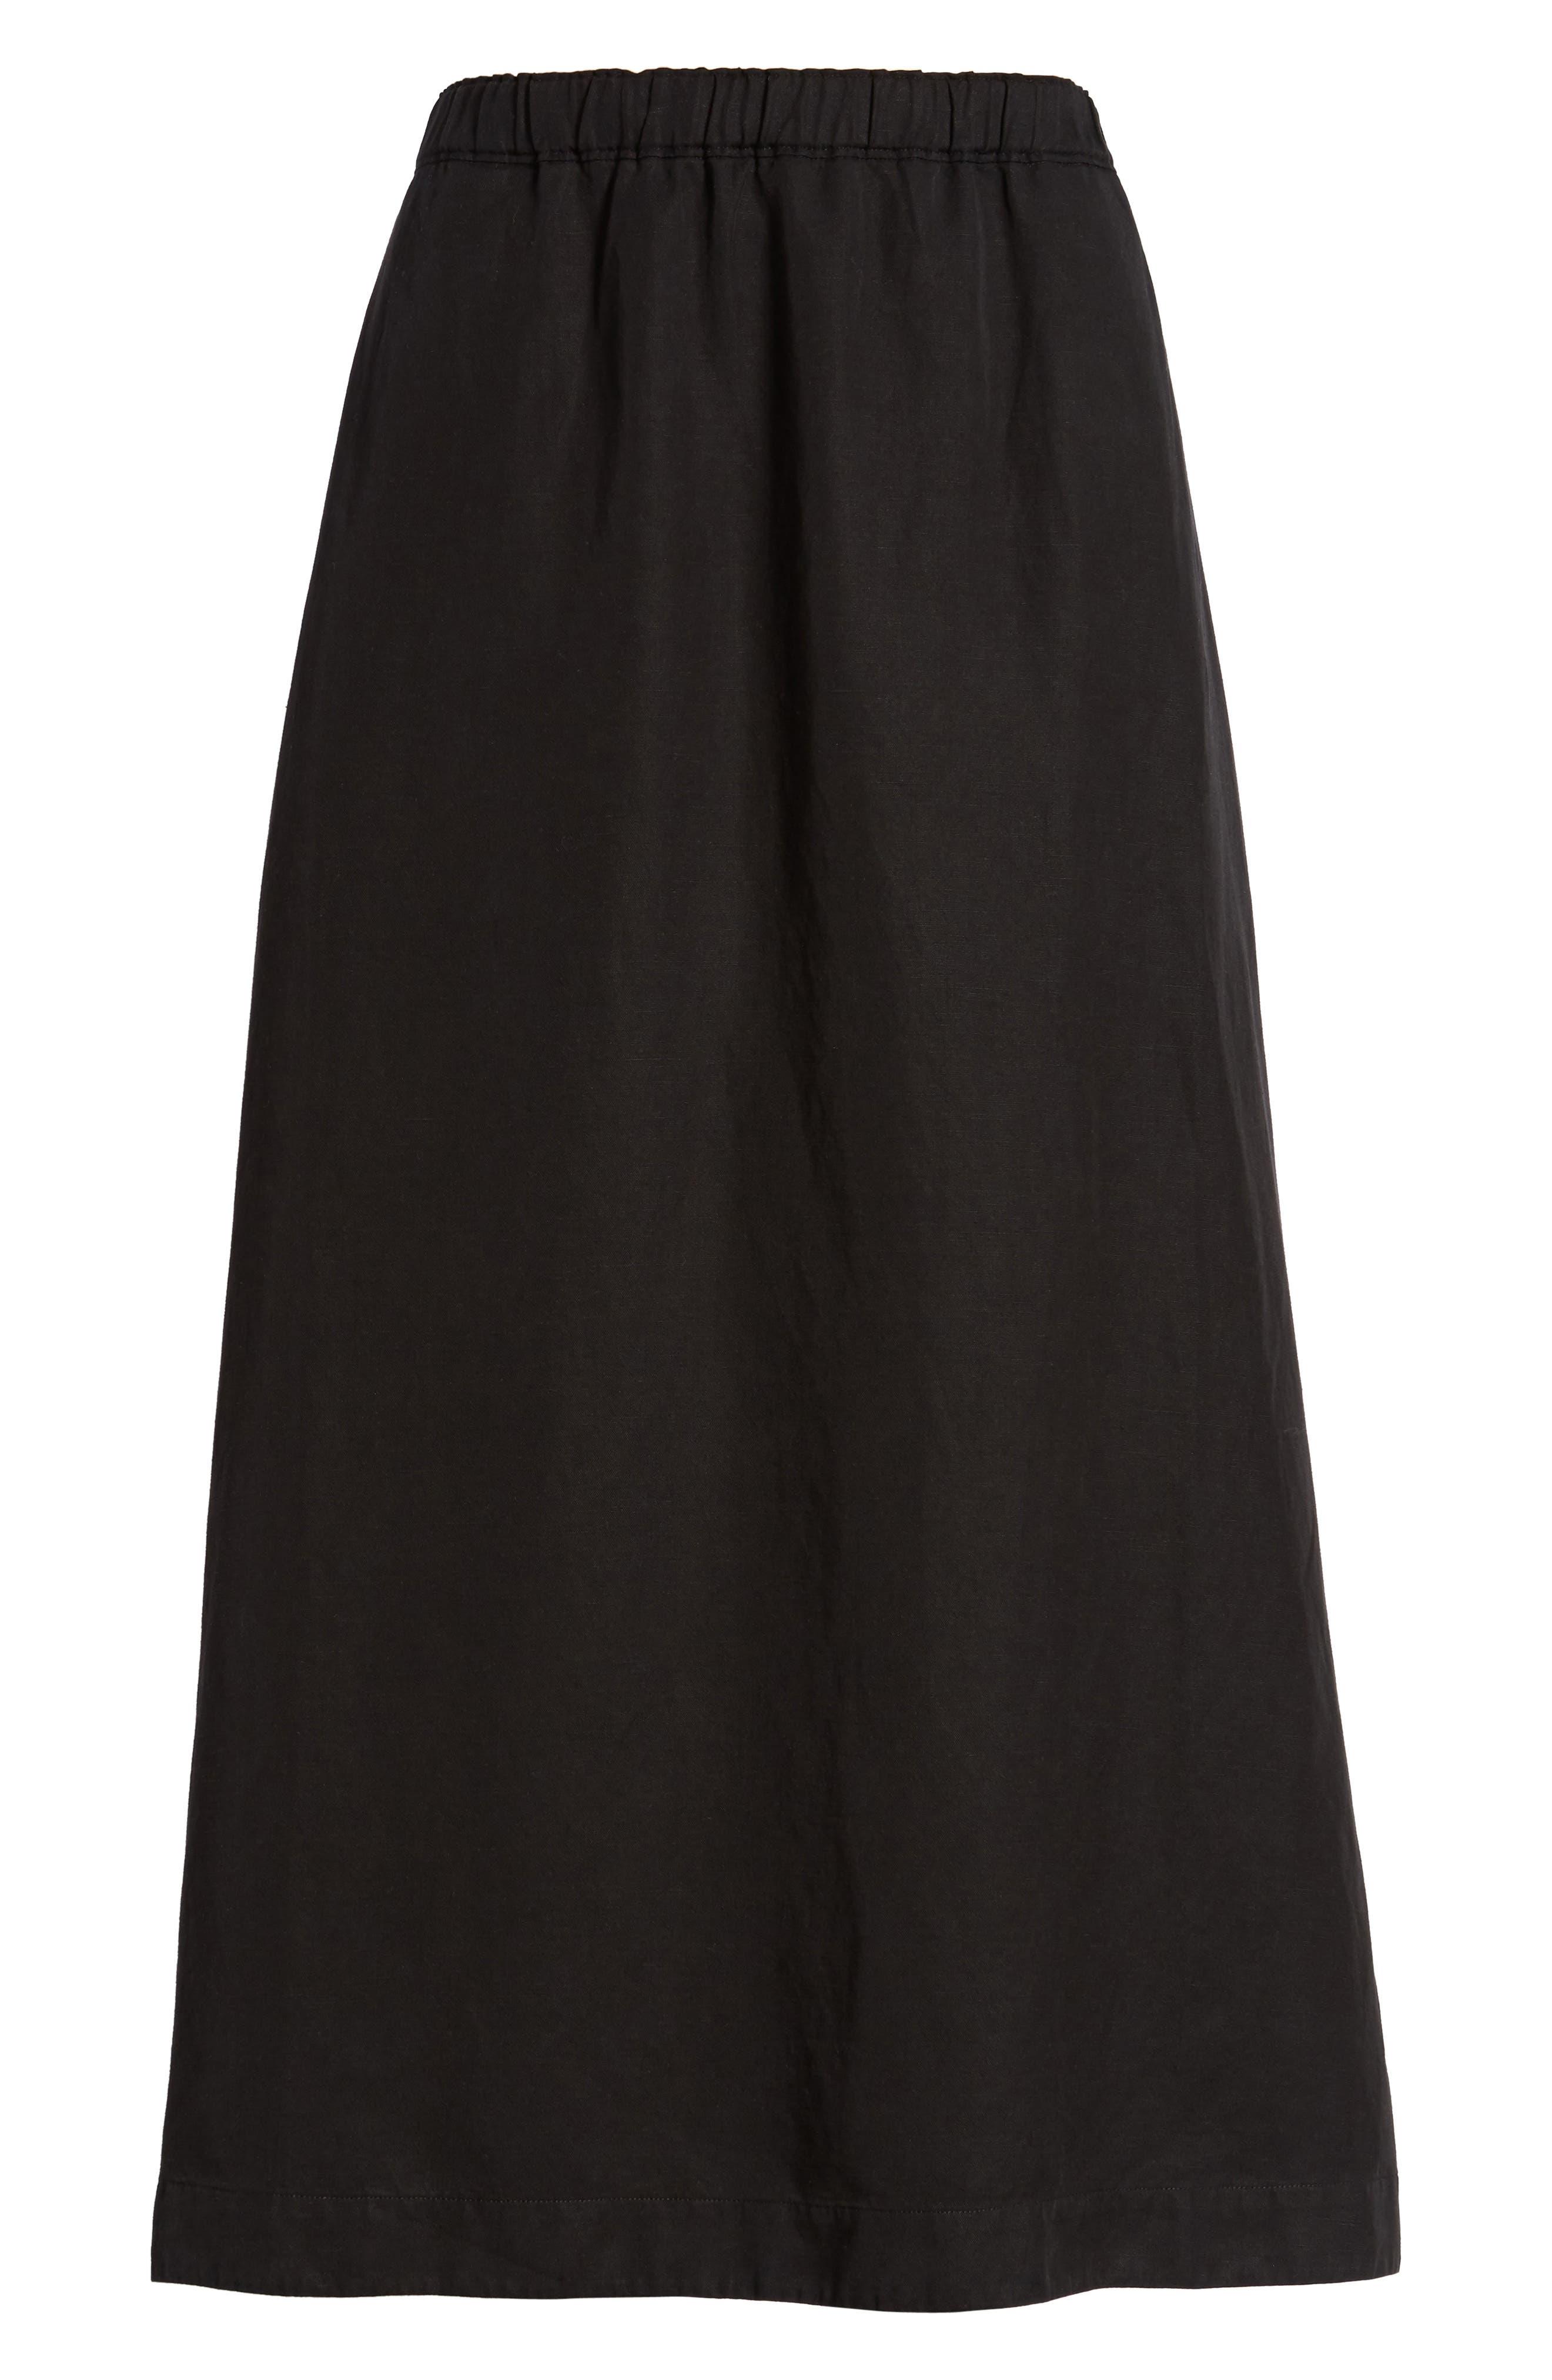 Tencel<sup>®</sup> Lyocell & Linen Midi Skirt,                             Alternate thumbnail 6, color,                             001